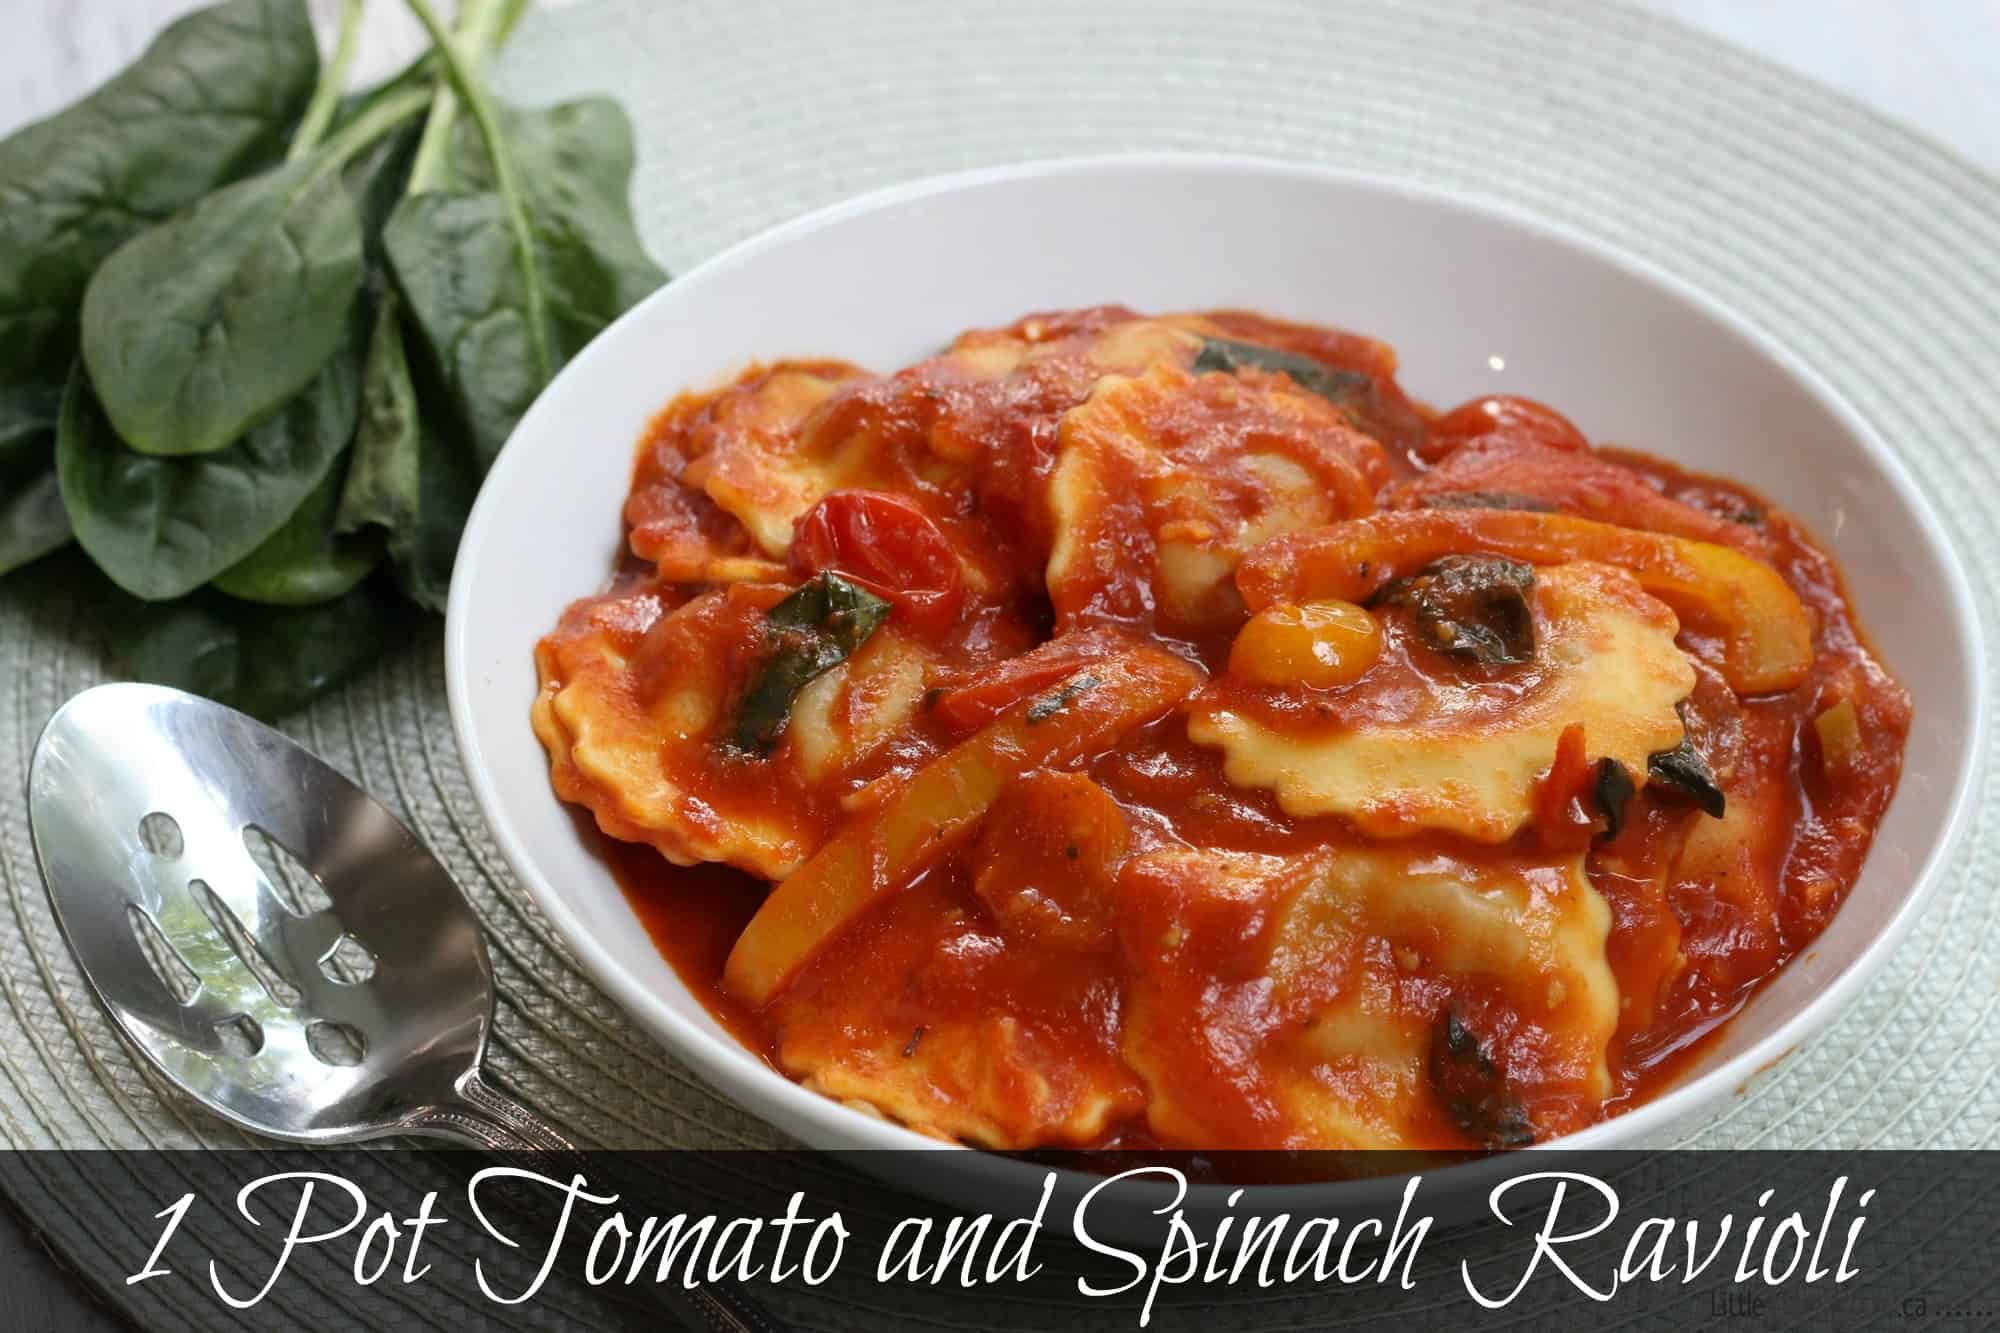 Easy Healthy Dinner Recipe: 1 Pot Tomato and Spinach Ravioli